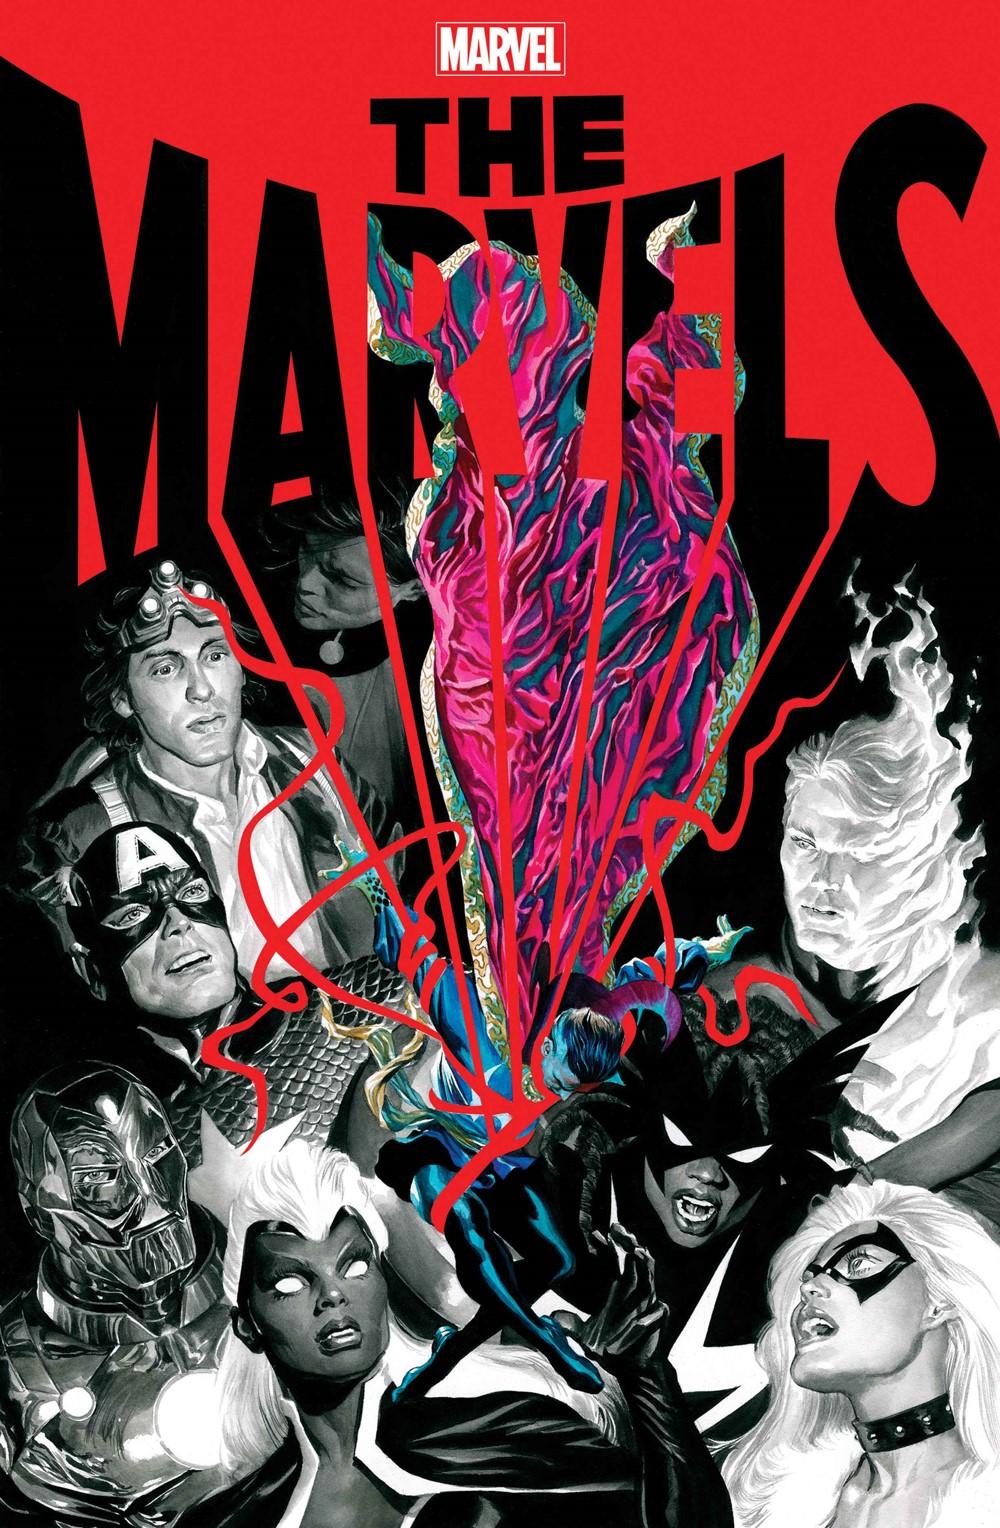 MAR2021005_Cov-Dressed Marvel Comics September 2021 Solicitations